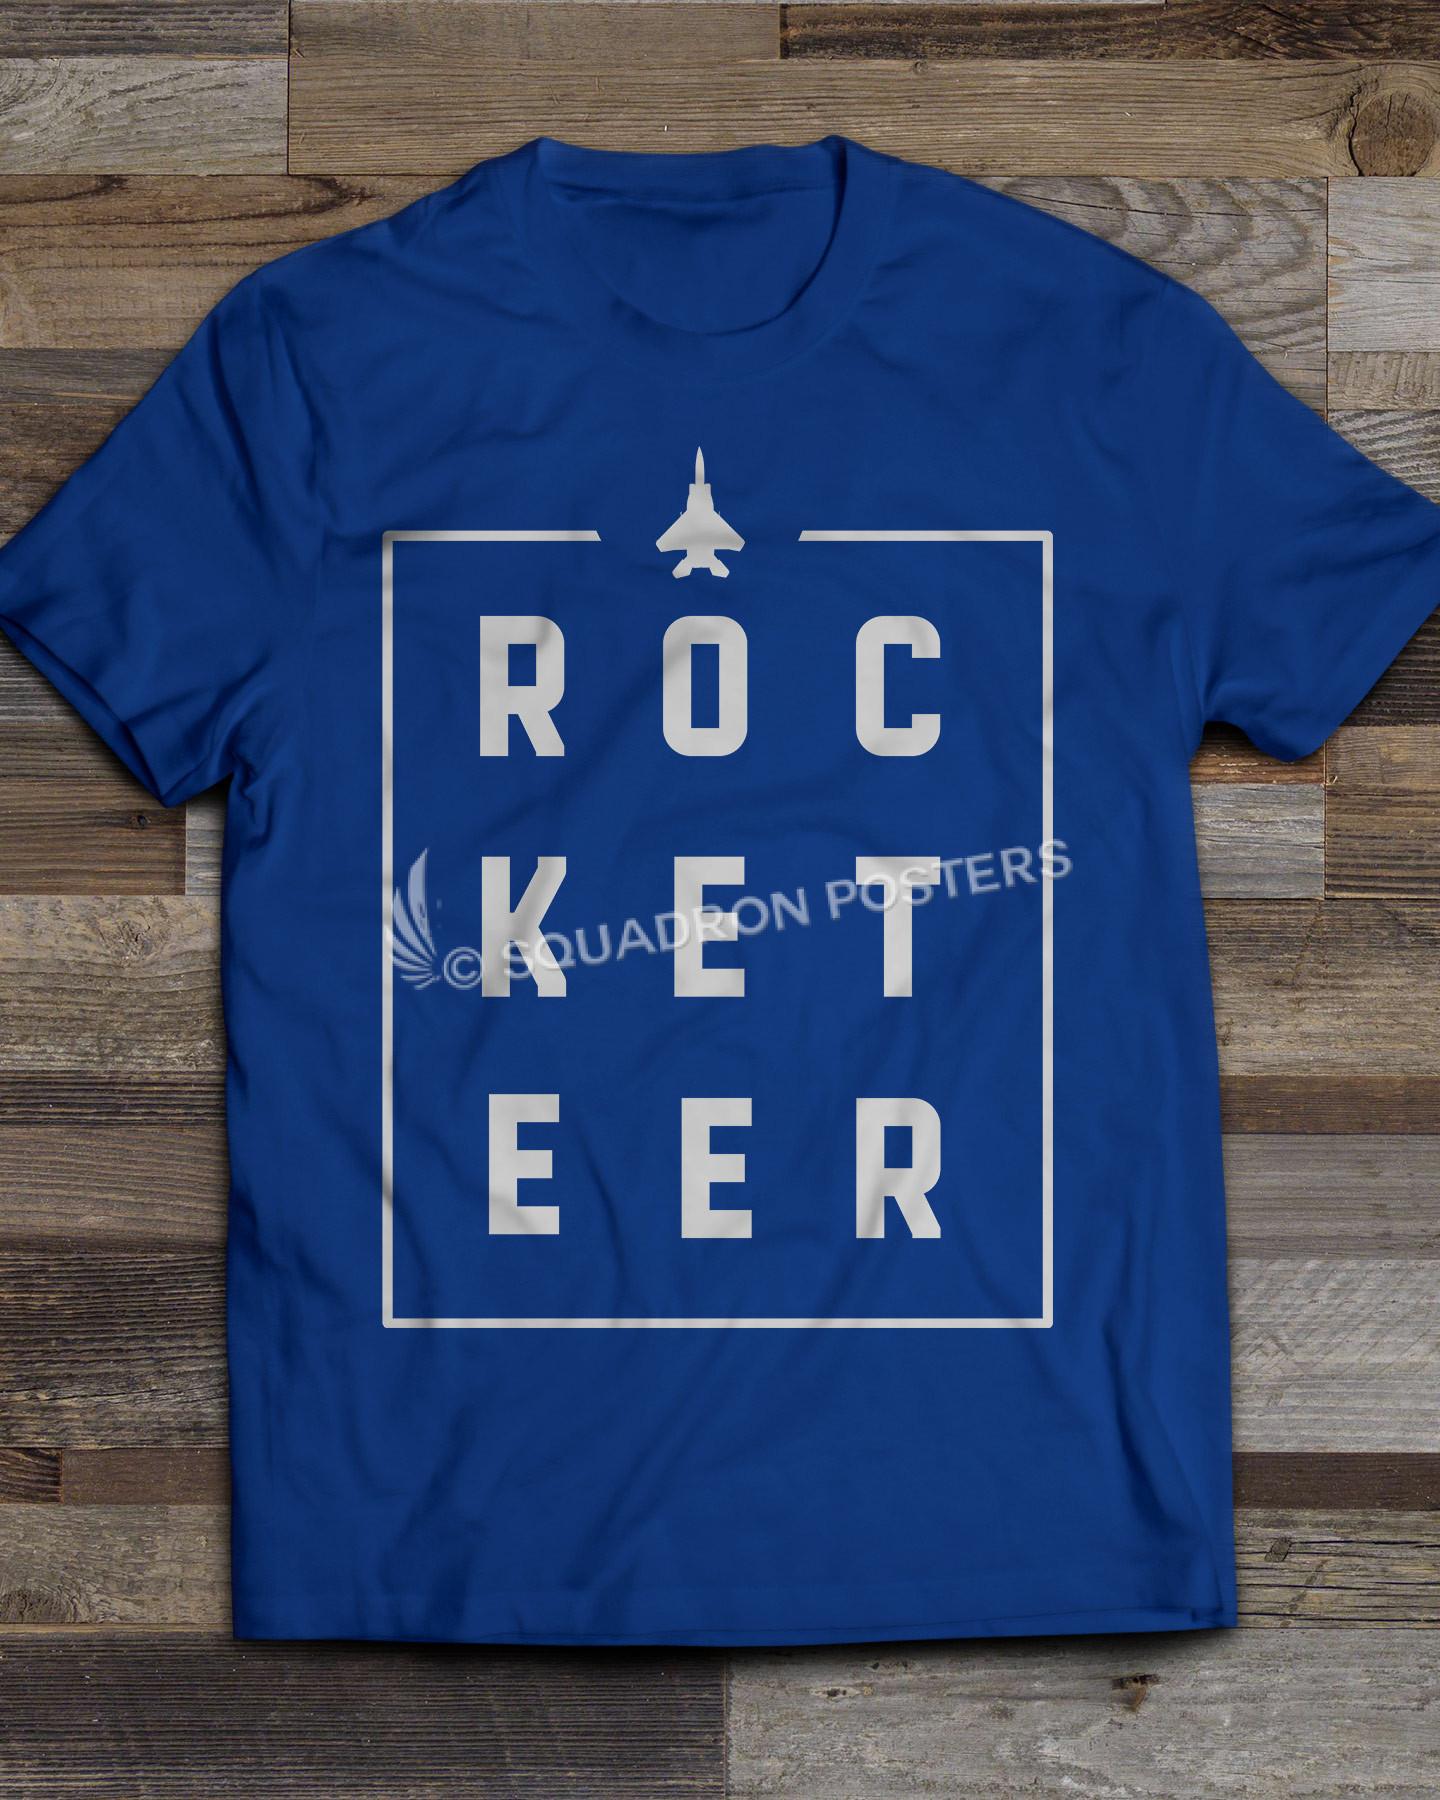 336 FS Rocketeers T-Shirt